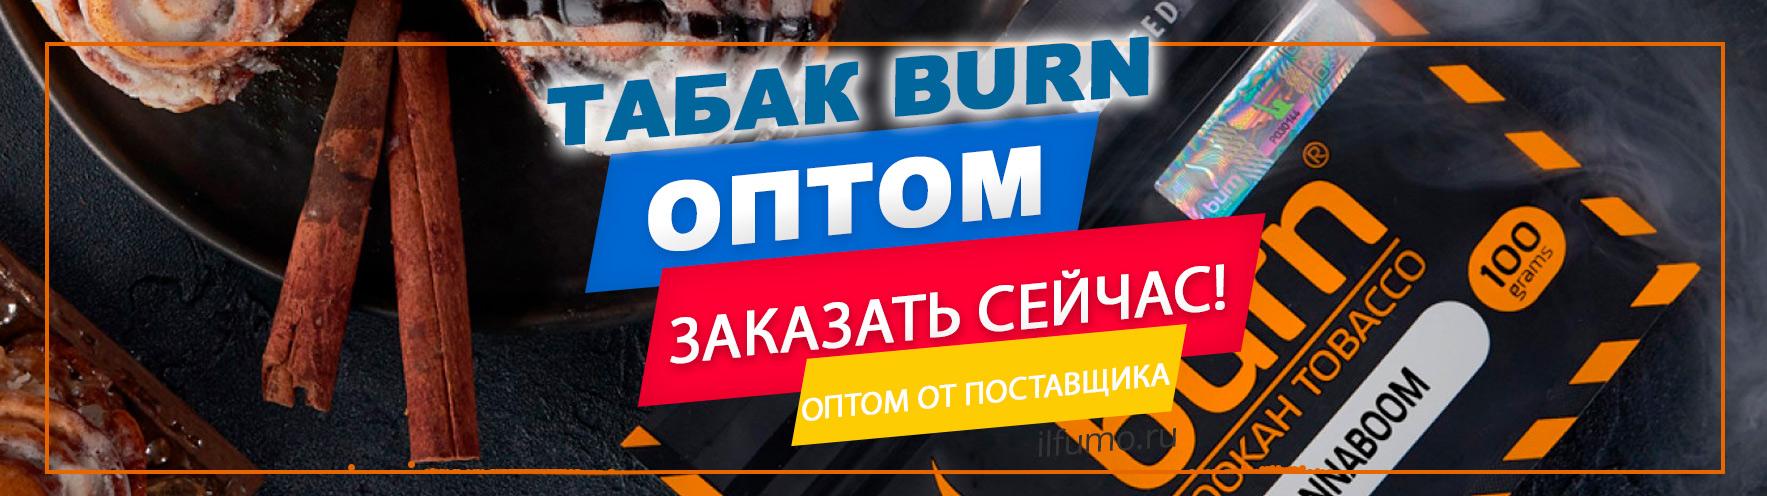 tabak burn - Табак для кальяна BURN